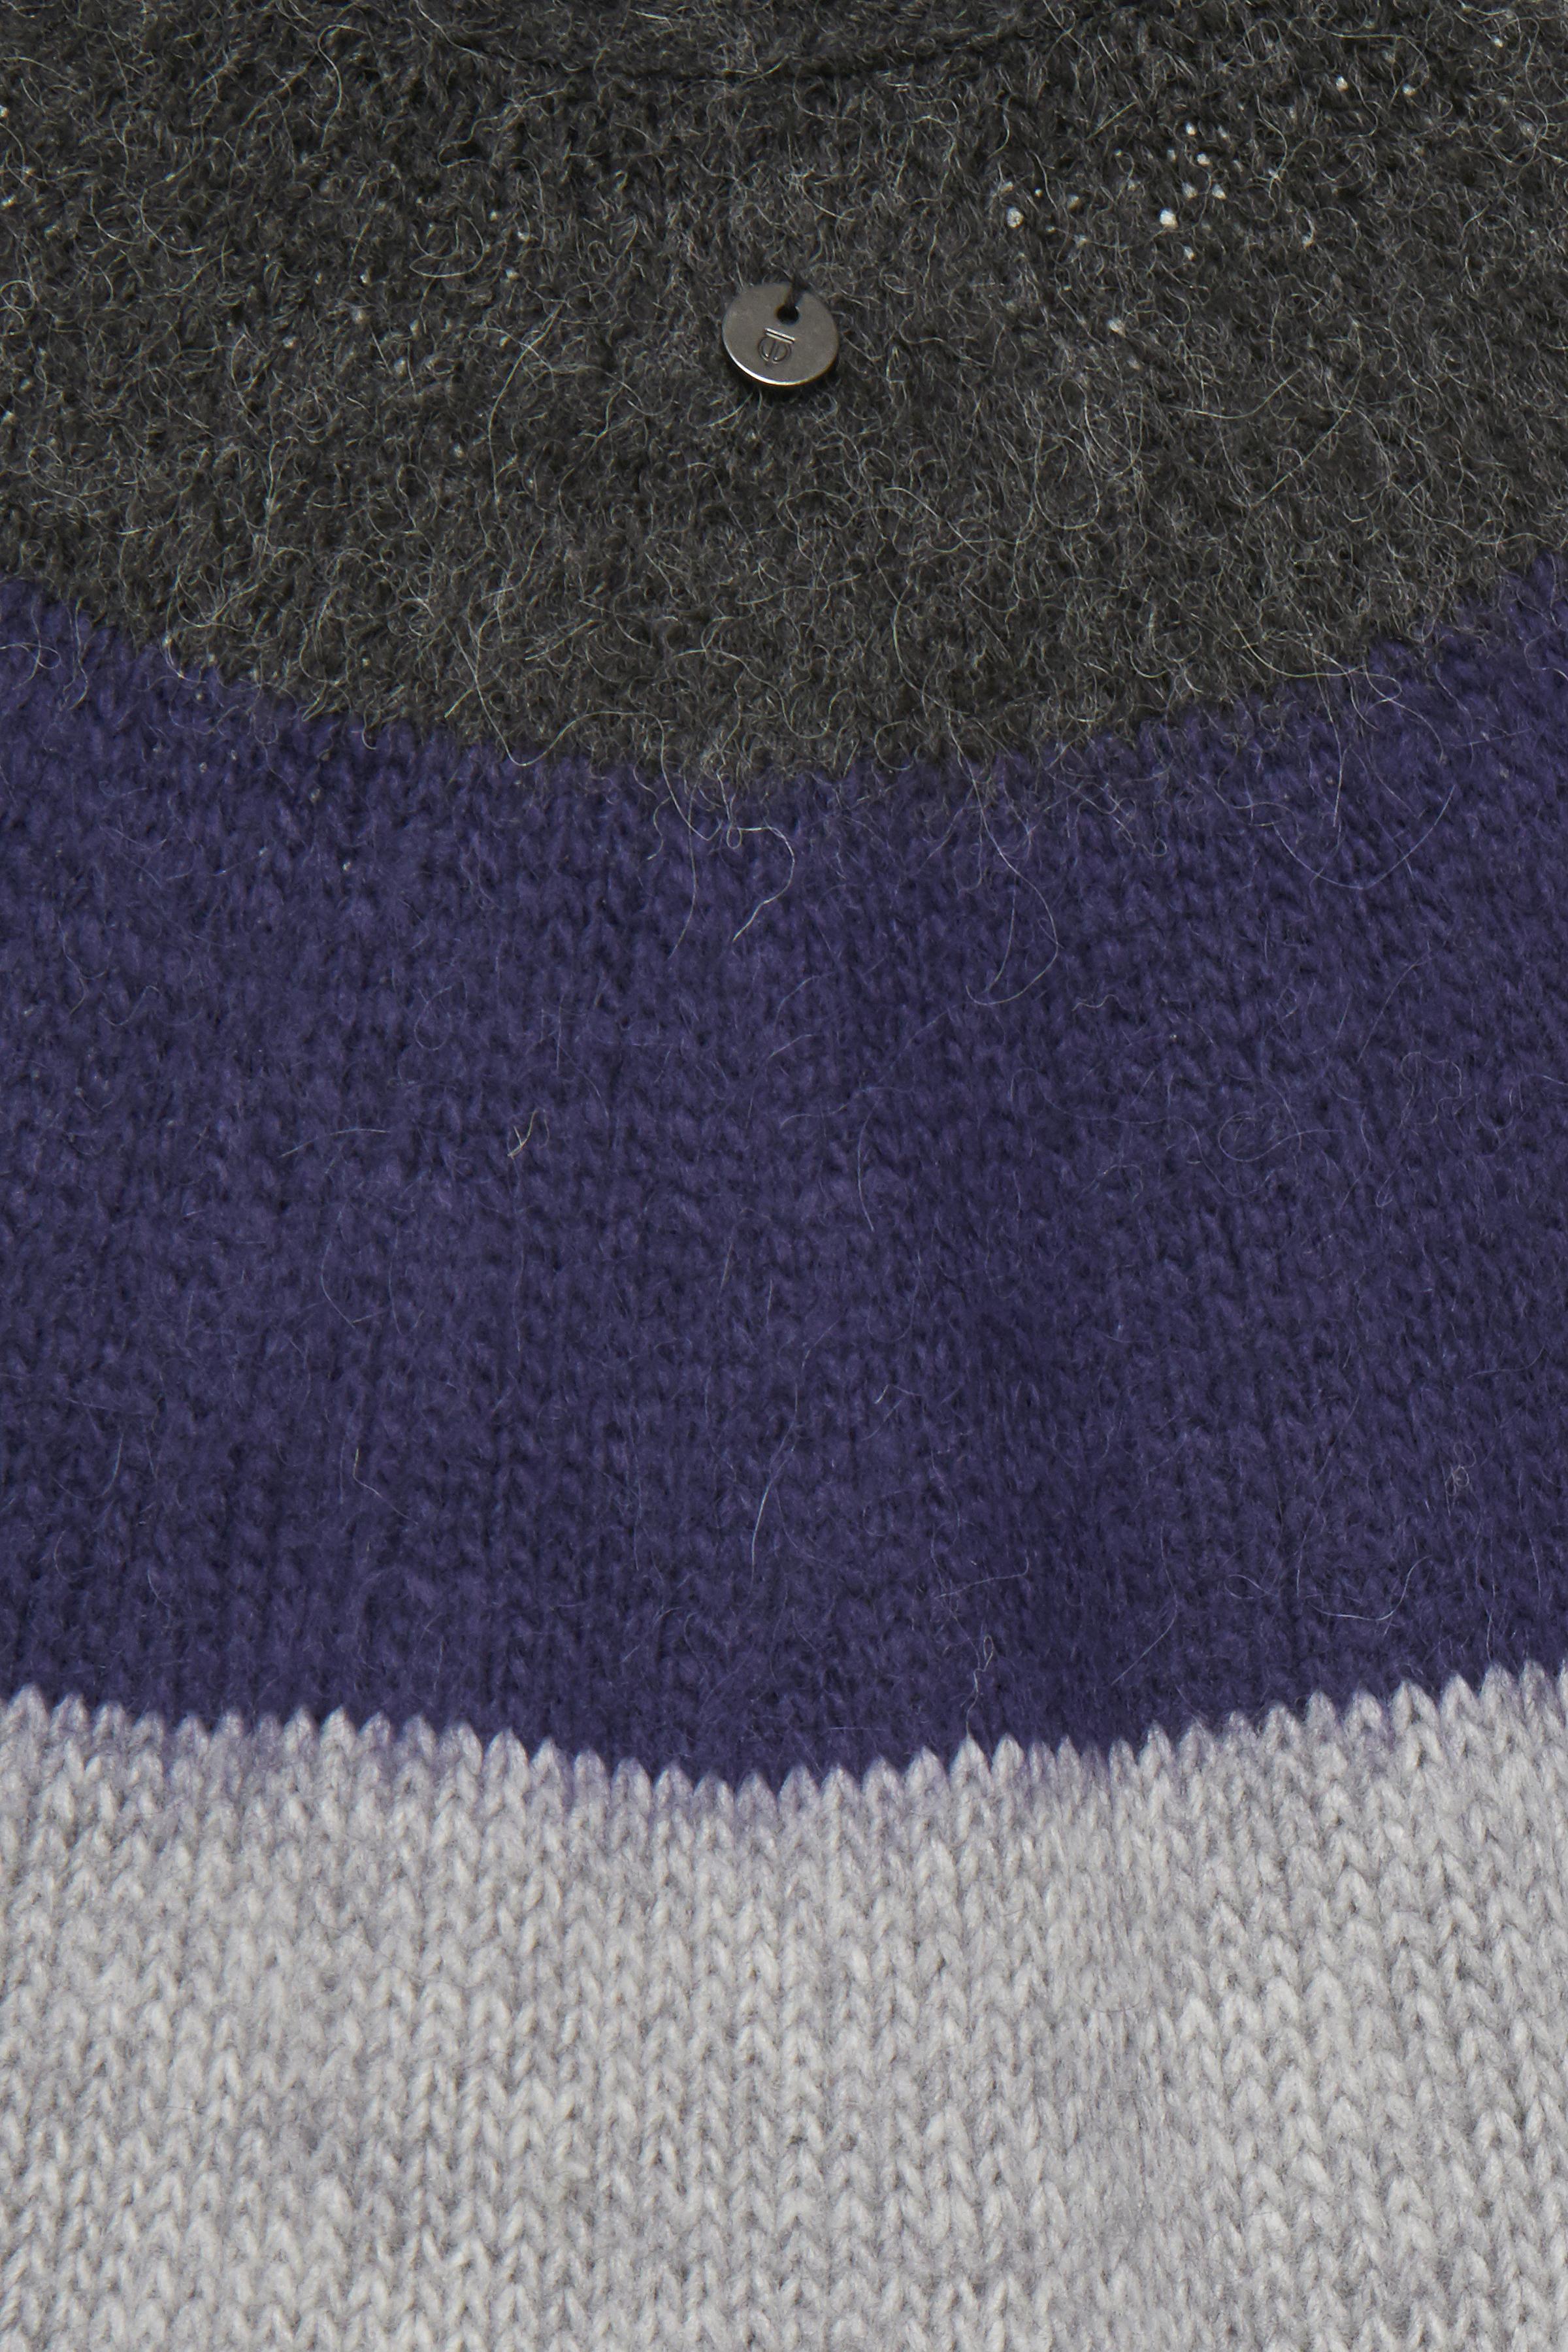 Mørk gråmeleret/lilla Strikpullover fra Pulz Jeans – Køb Mørk gråmeleret/lilla Strikpullover fra str. XS-XXL her